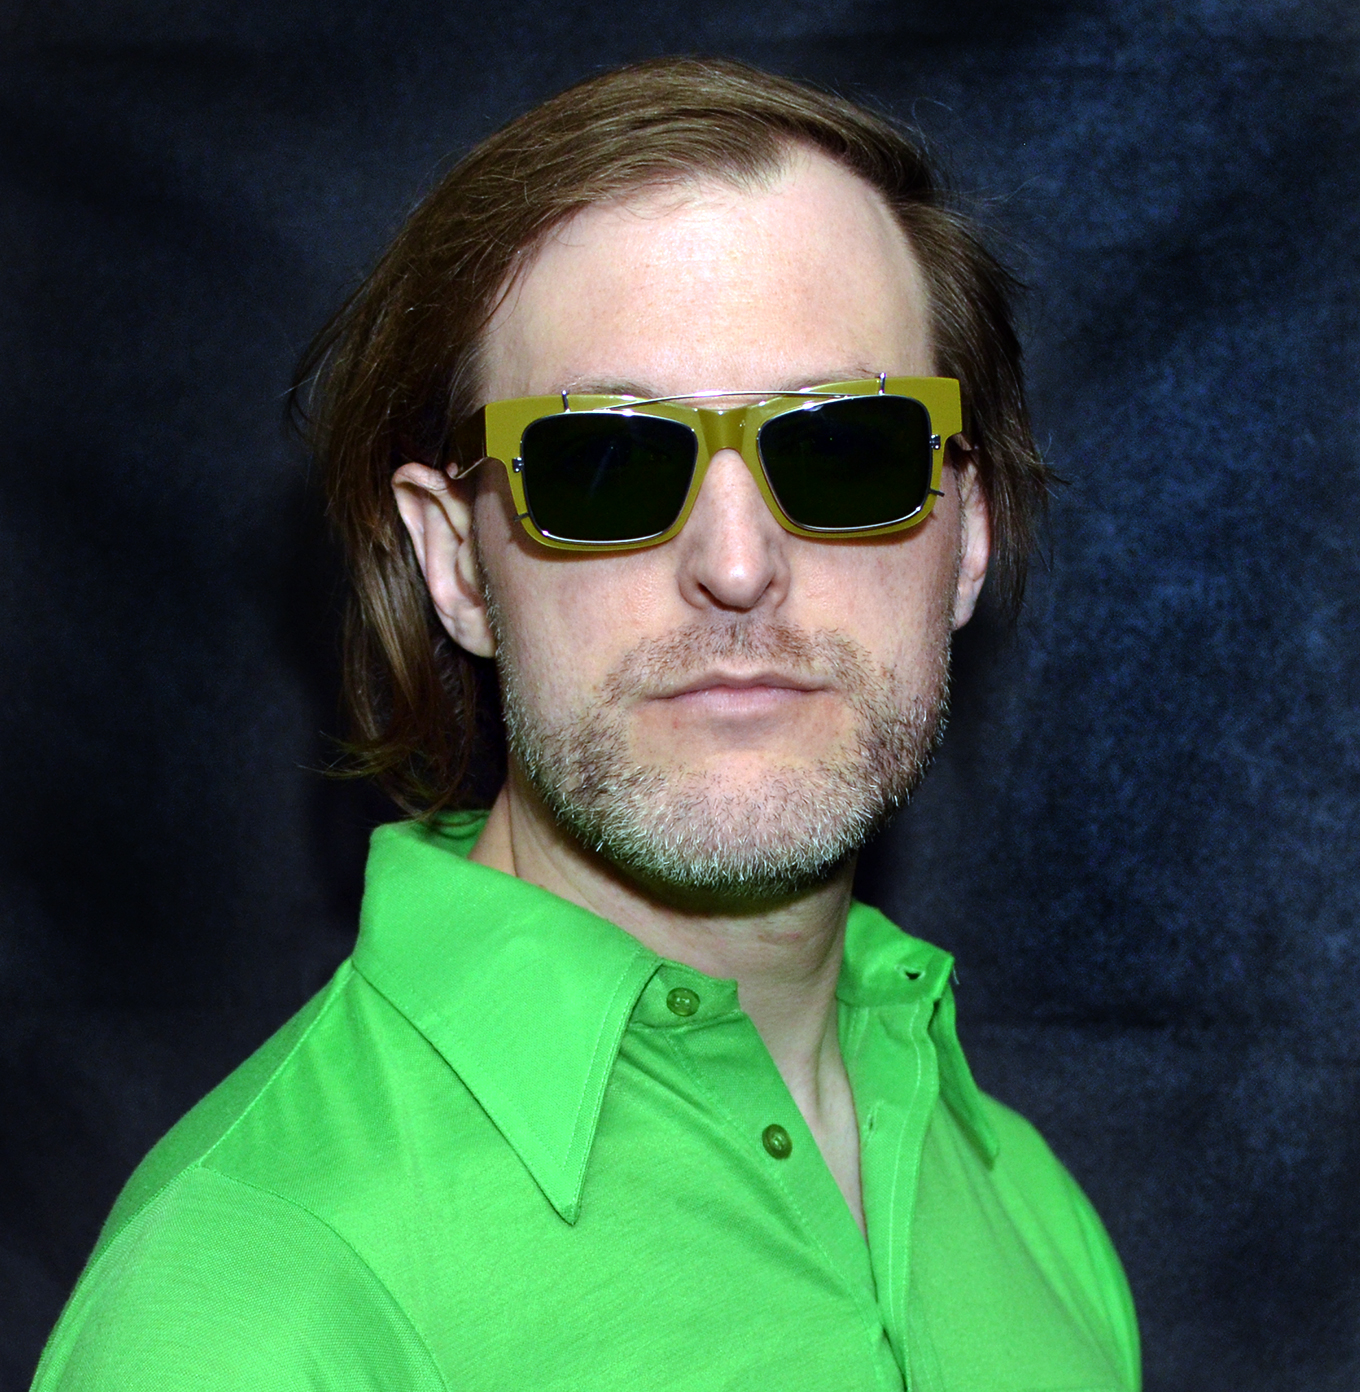 d-privacy-sunglasses-irpair-phantom-surveillance-eyewear-infrared.jpg